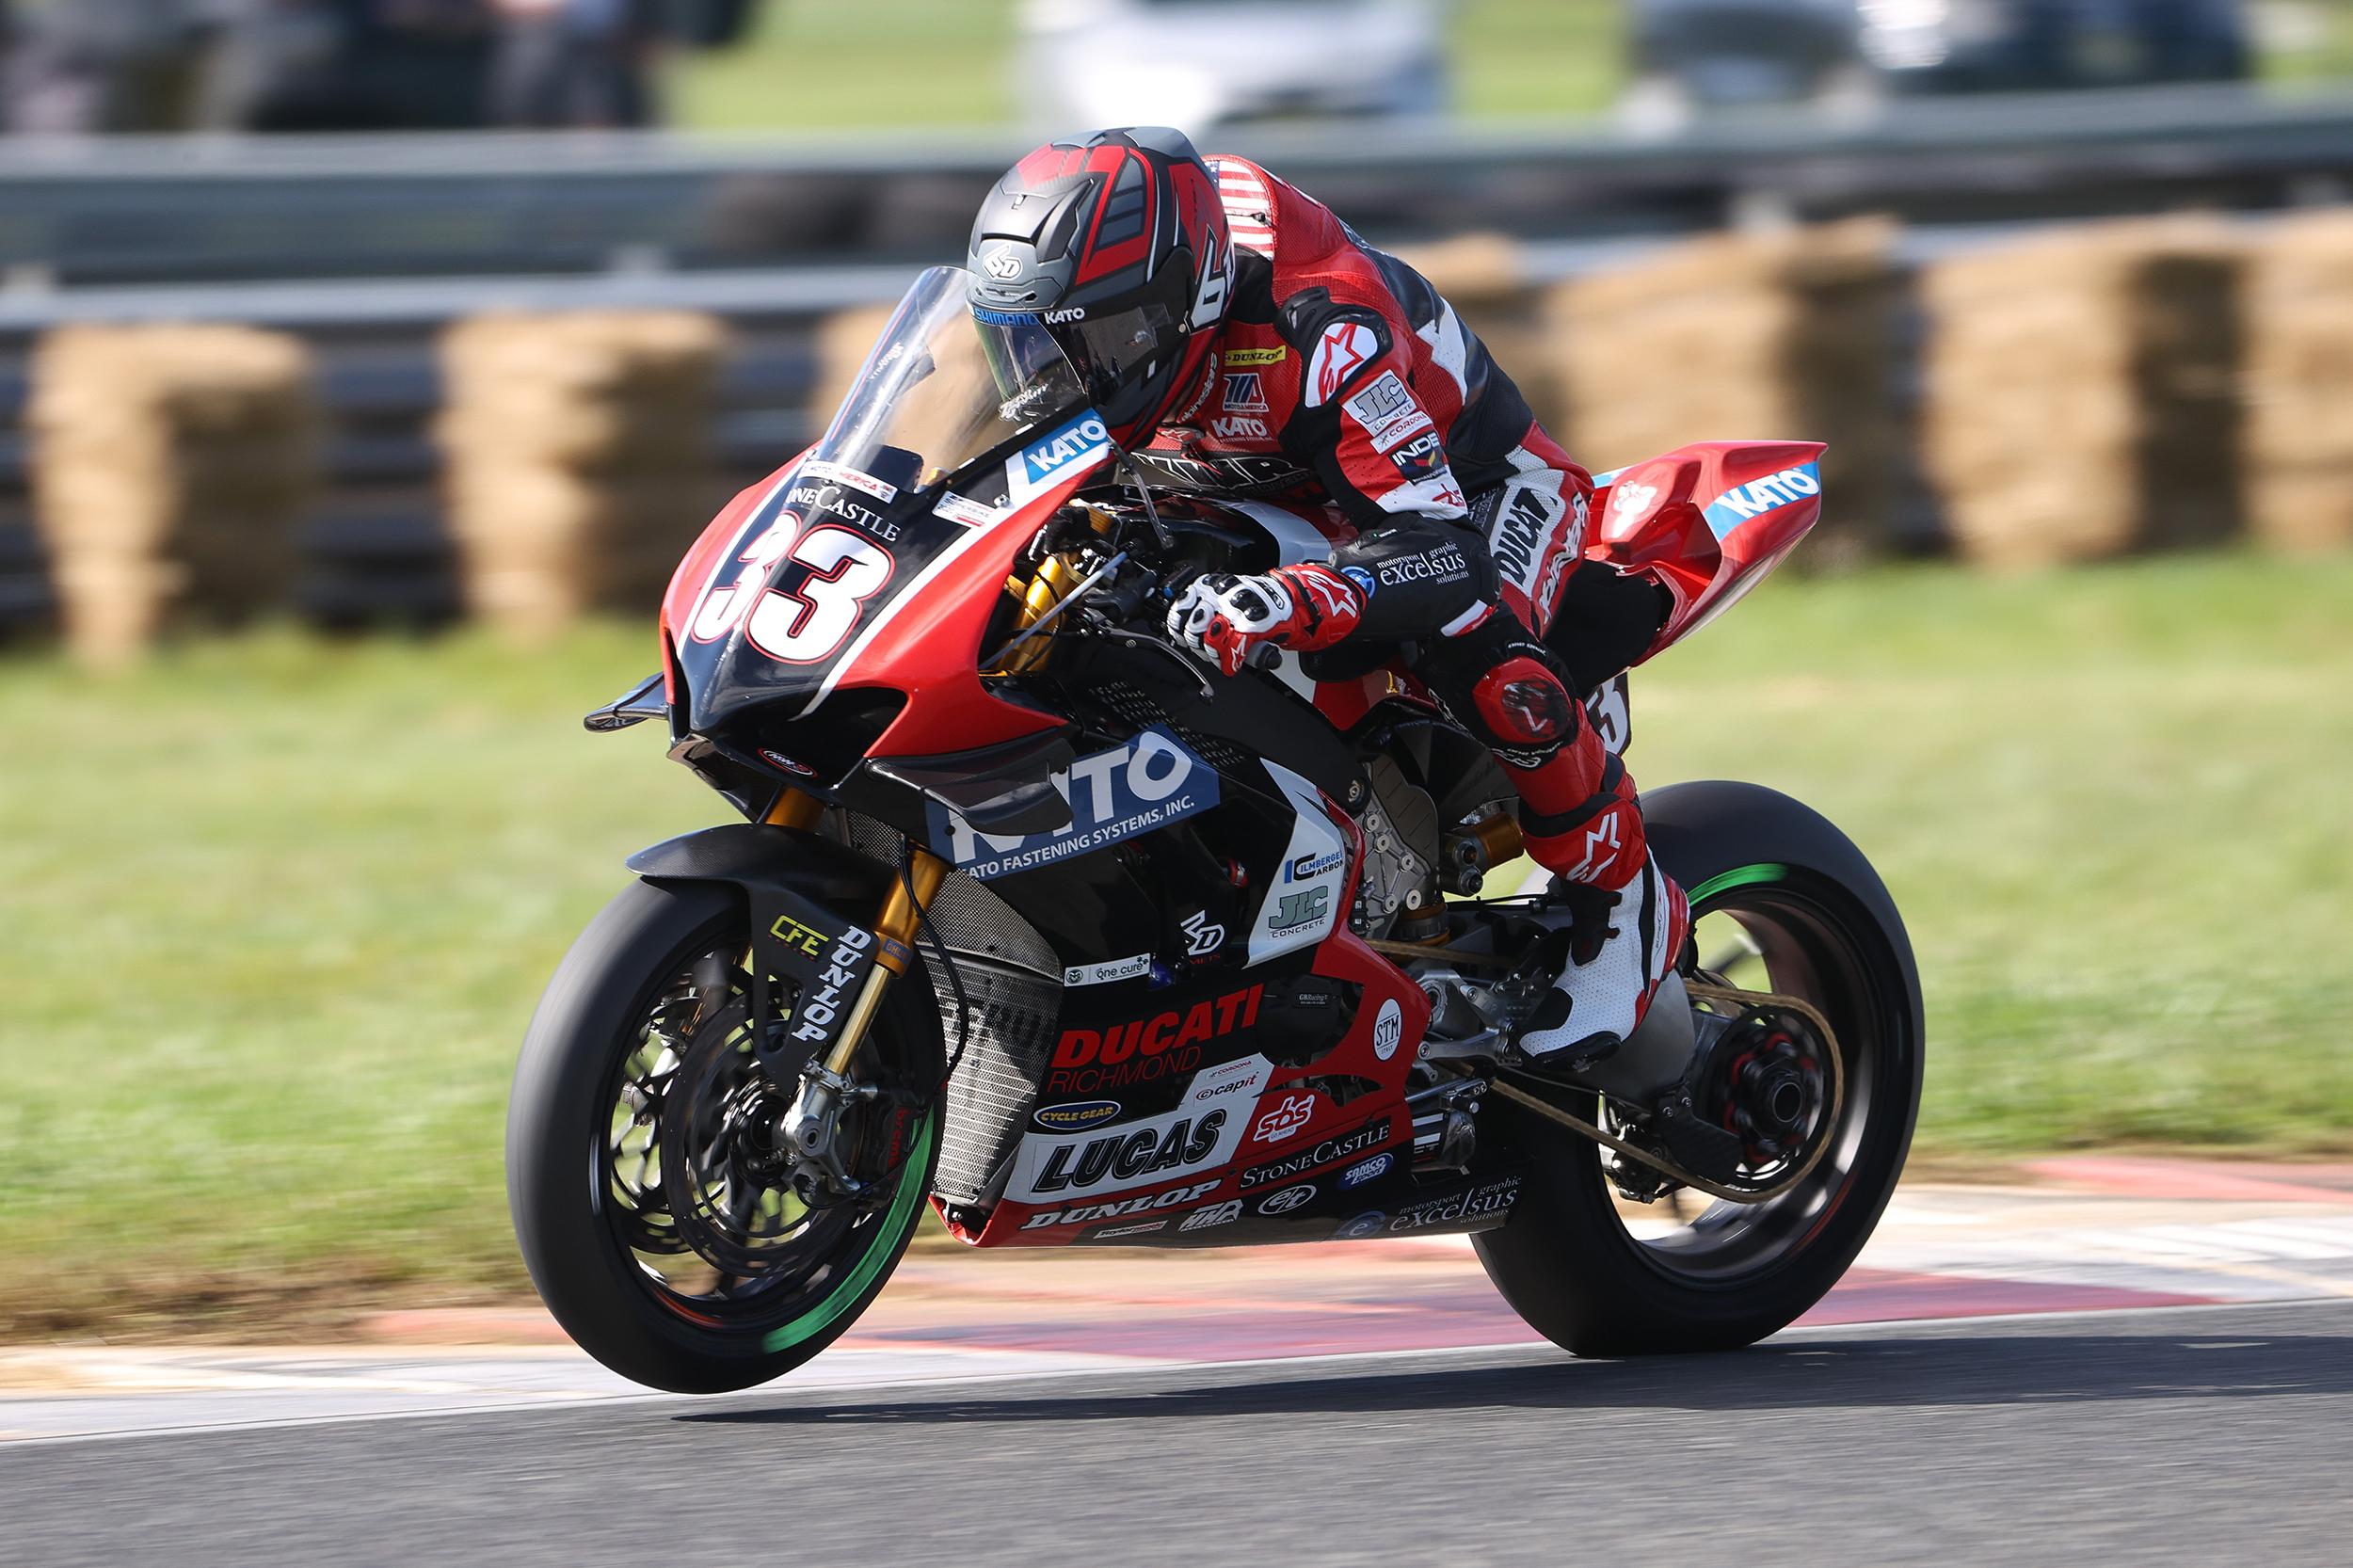 200914 MotoAmerica - Kyle Wyman - #33 - New Jersey Motorsports Park (2)